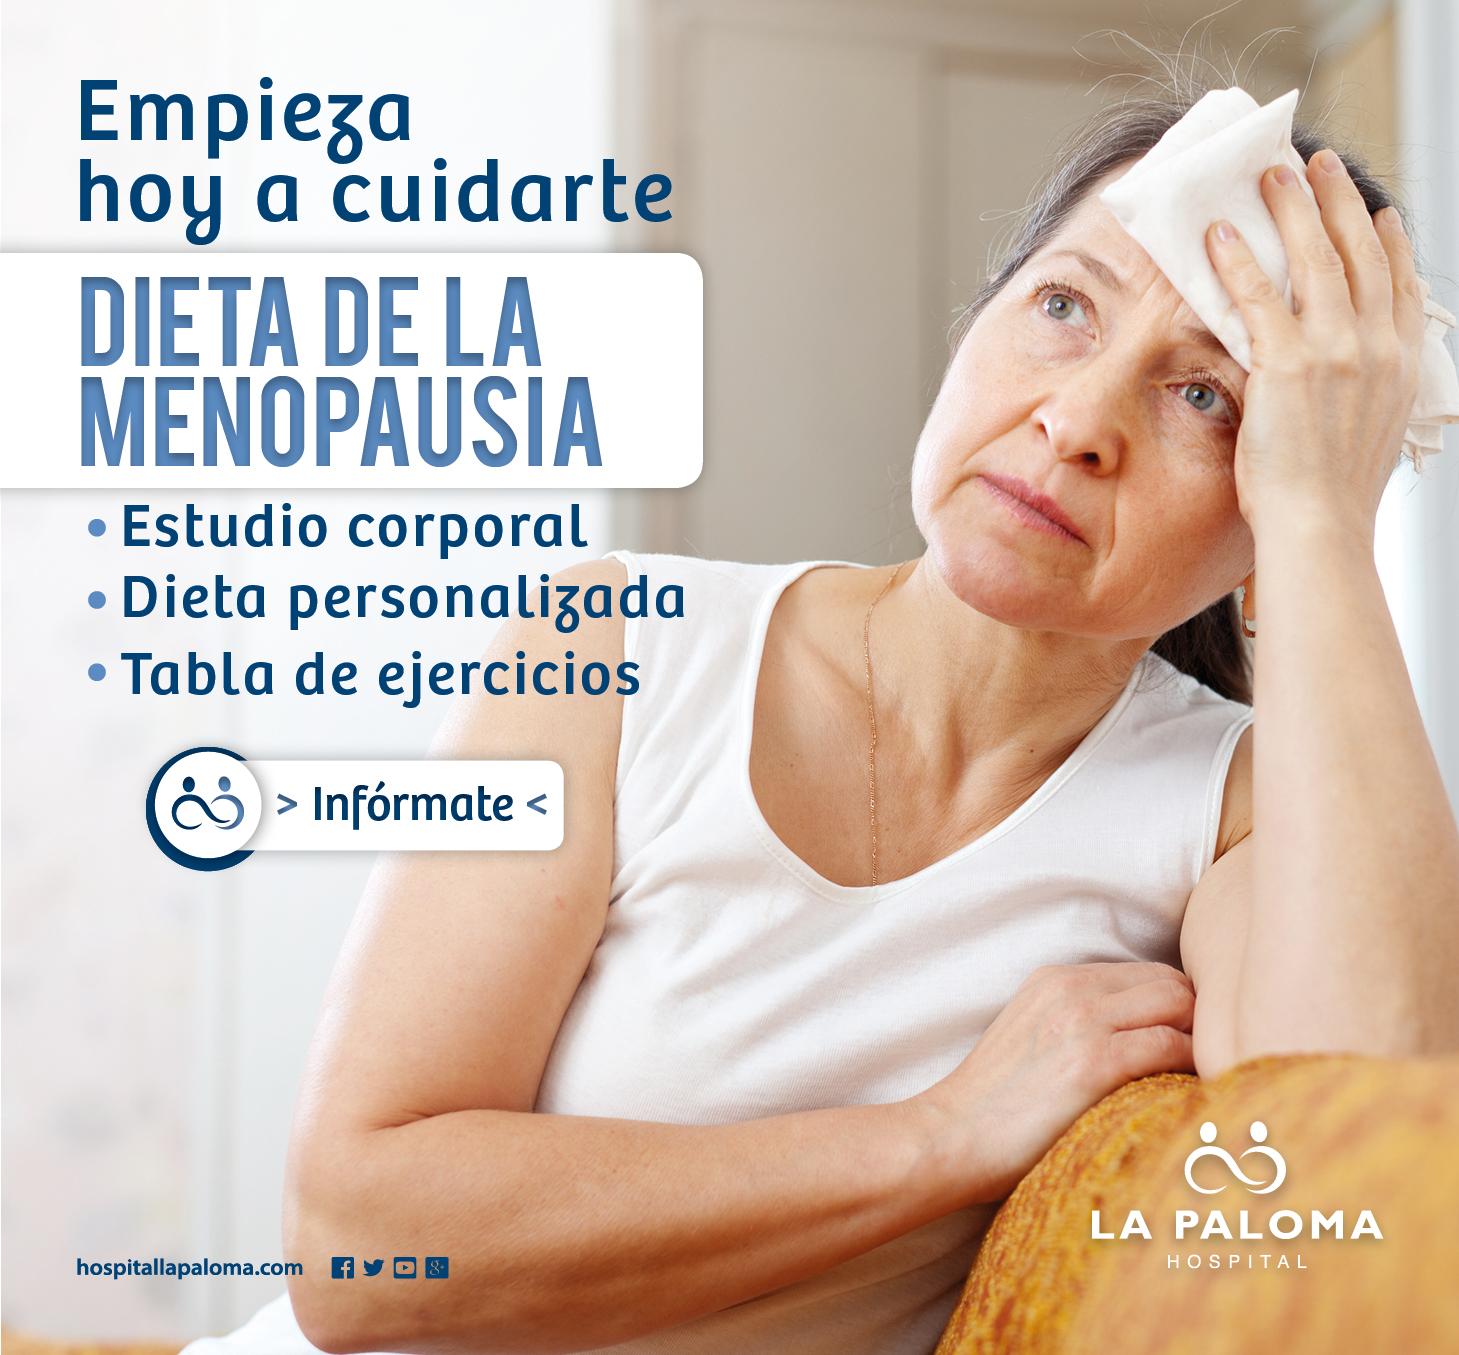 Promoción Dieta en la menopausia - Hospital La Paloma